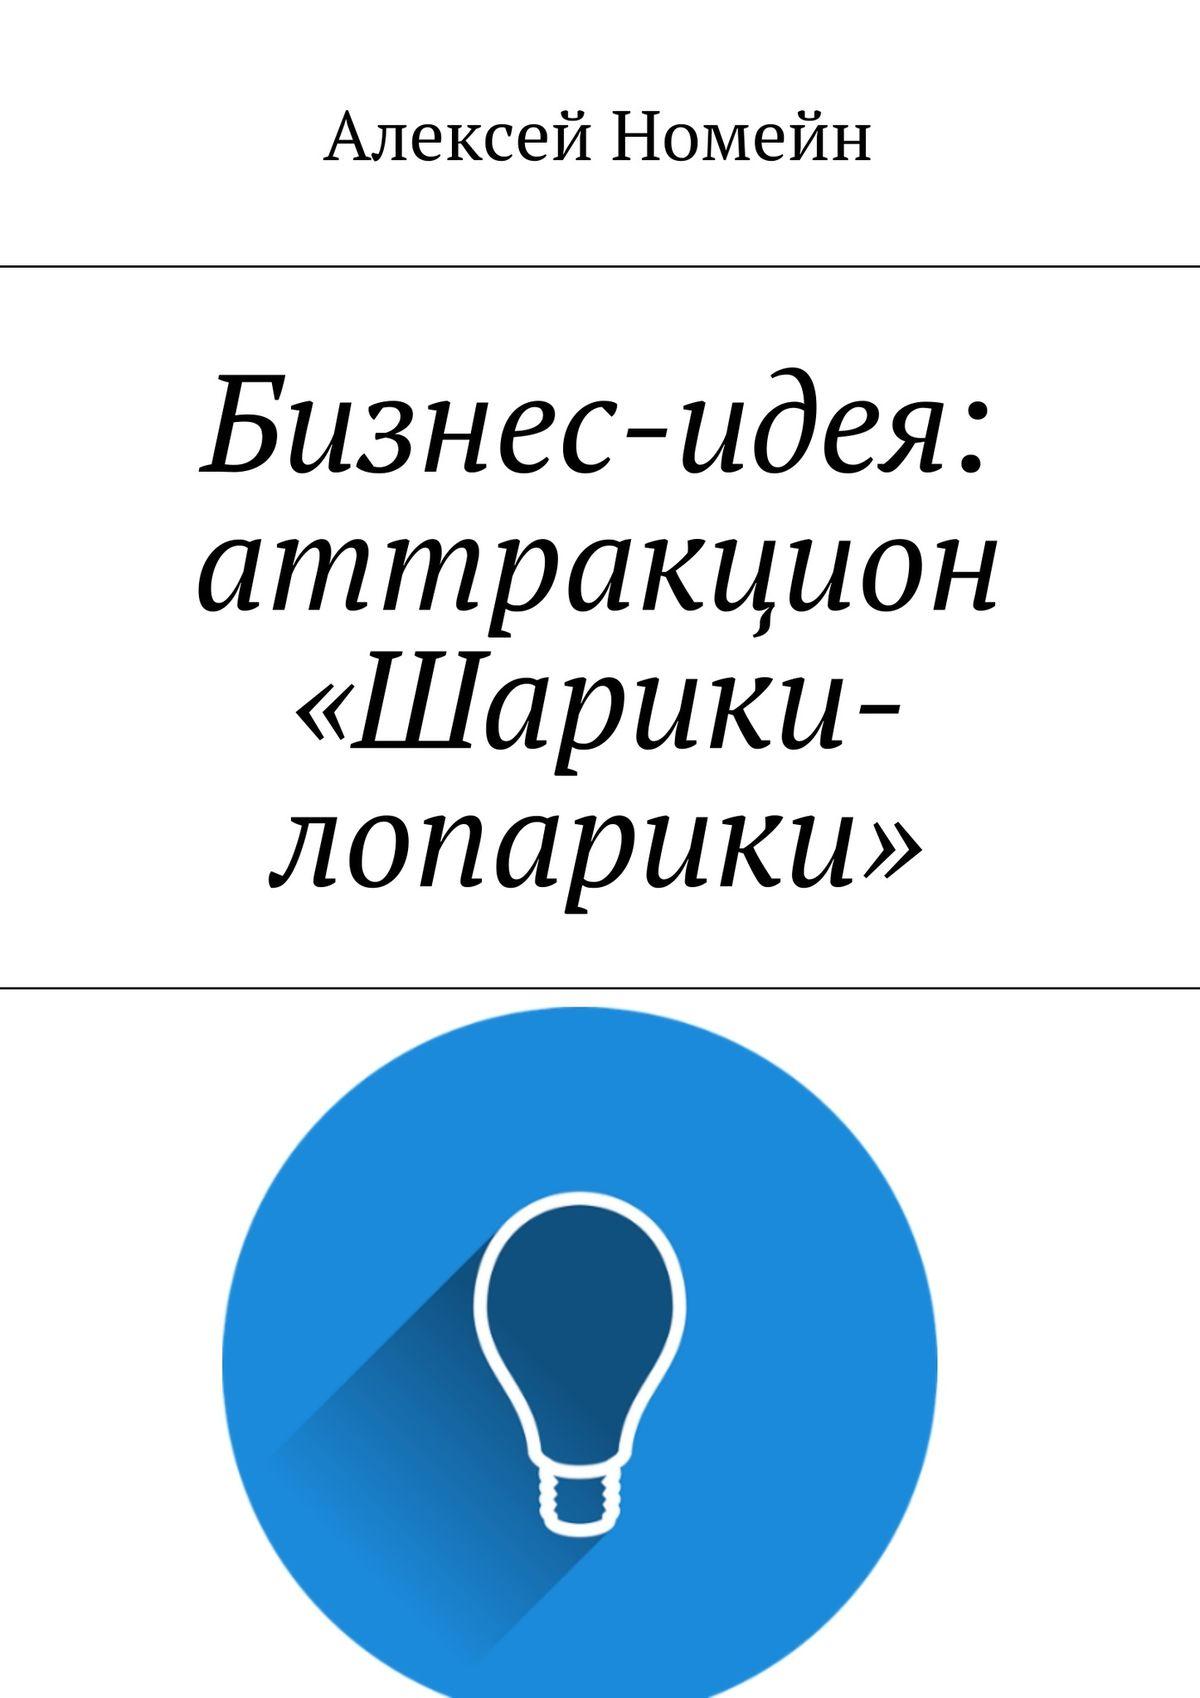 Алексей Номейн Бизнес-идея: аттракцион «Шарики-лопарики» алексей номейн бизнес идея гарант сервис